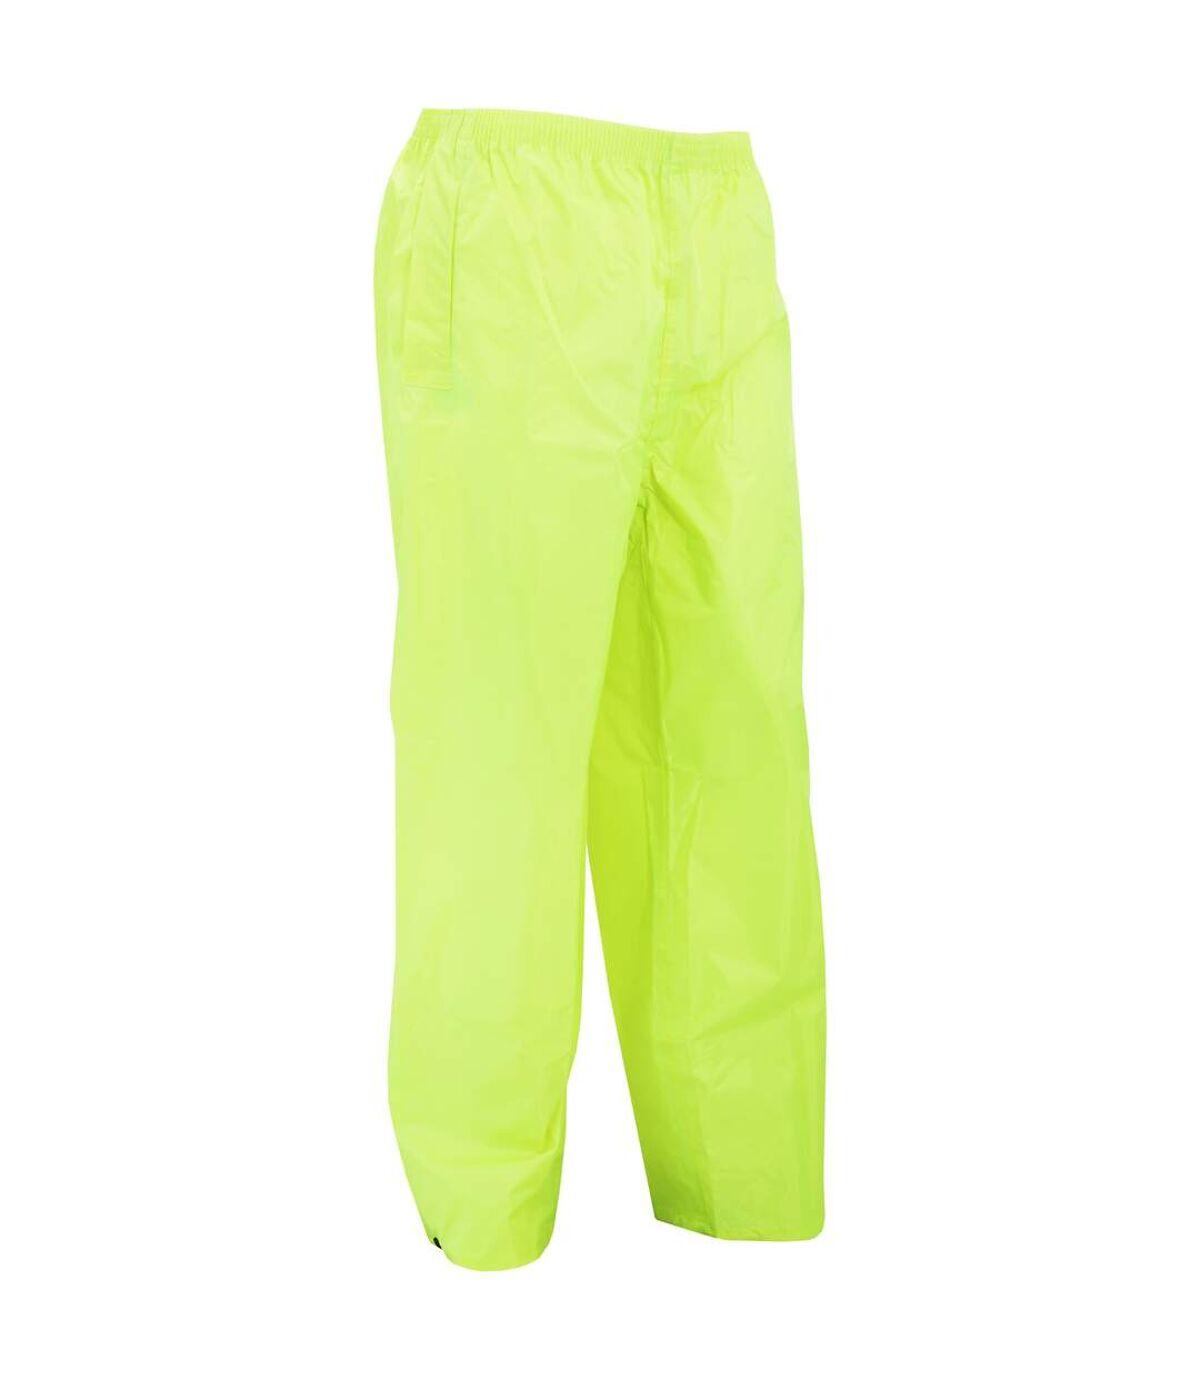 Portwest Mens Classic Rain Trouser (S441) / Pants (Navy) - UTRW1023